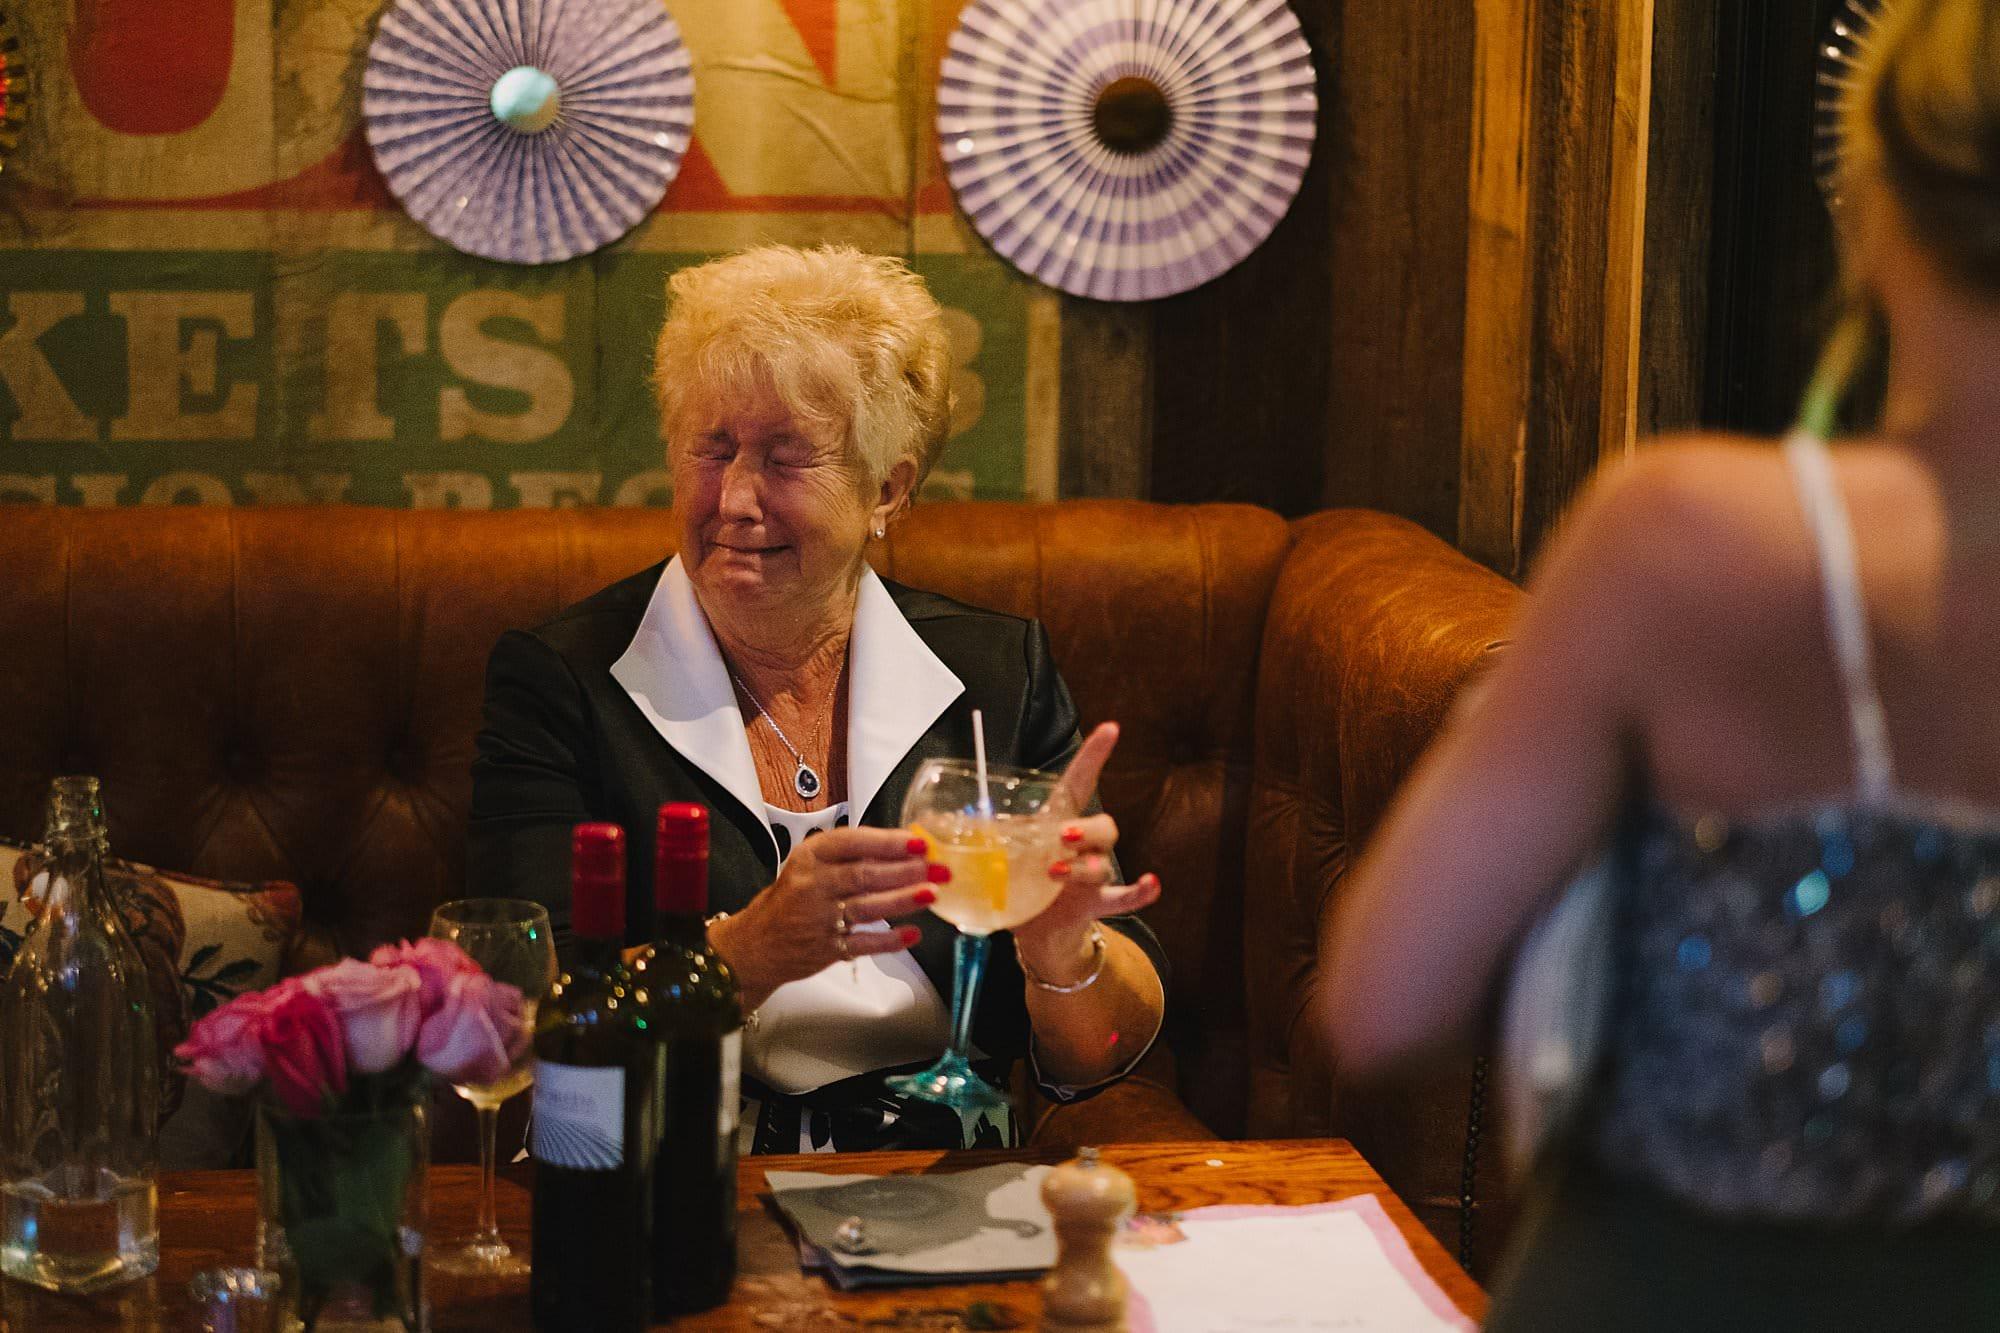 london pub wedding photographer jn 070 - The County Arms Wedding Photographer   Jen & Nick